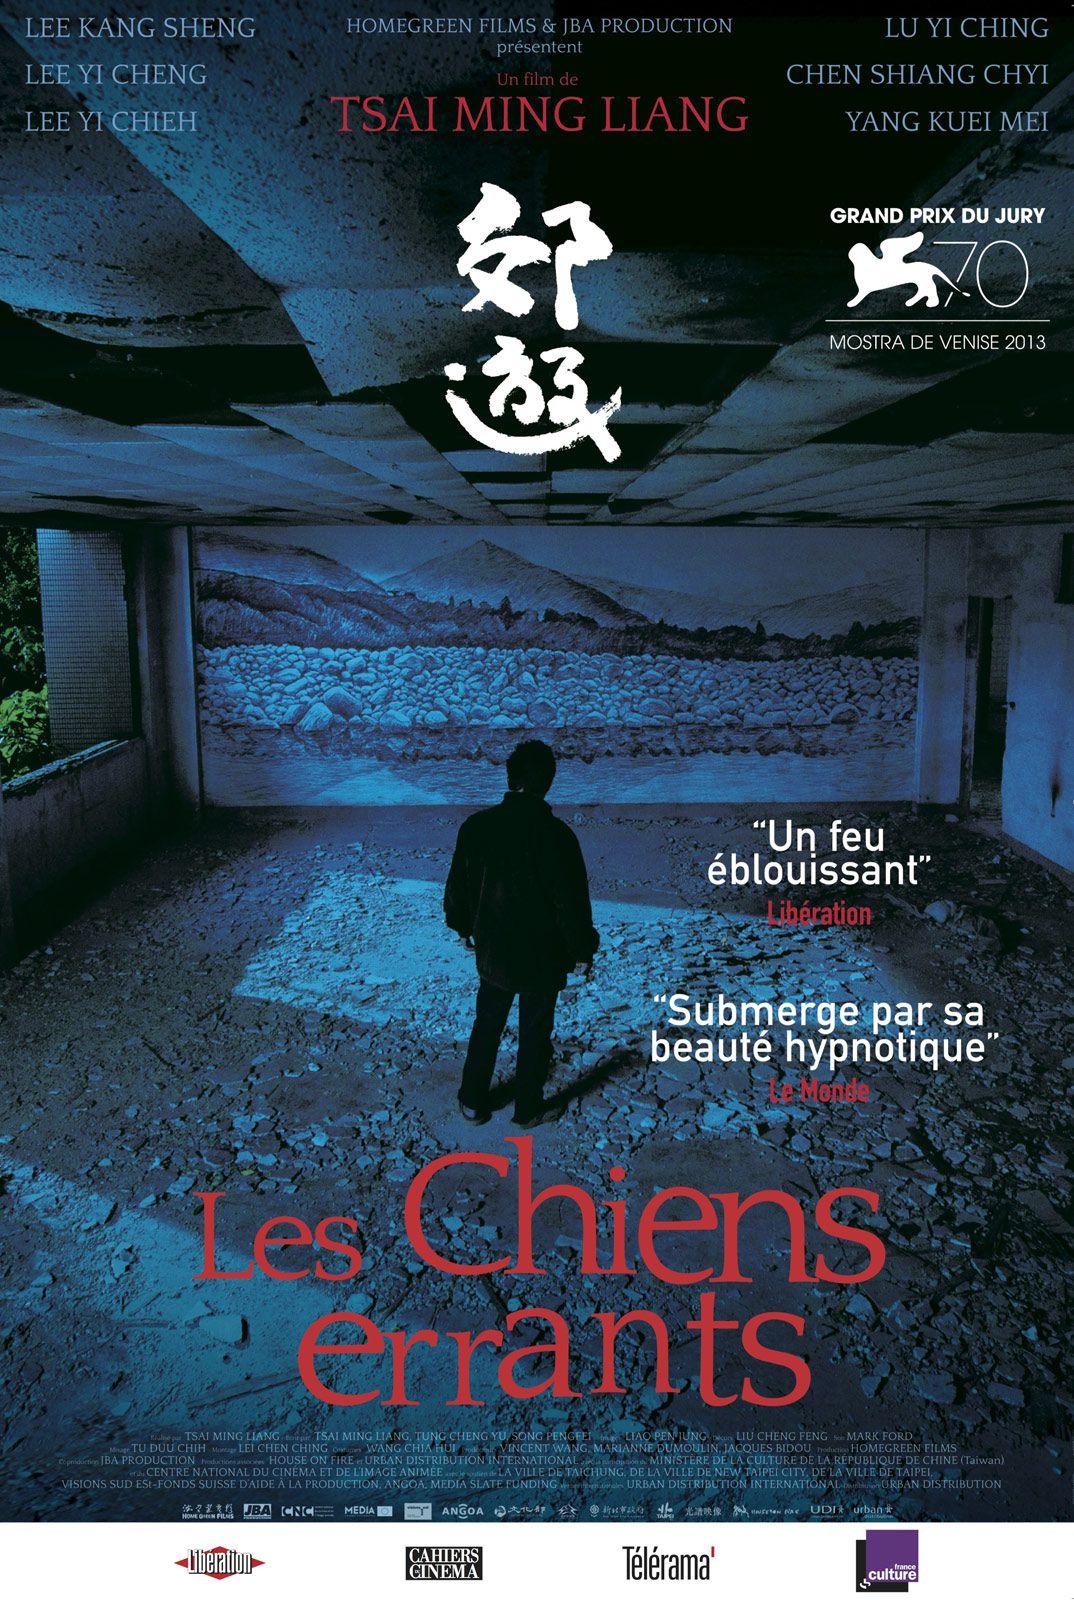 Les Chiens errants - Film (2013)